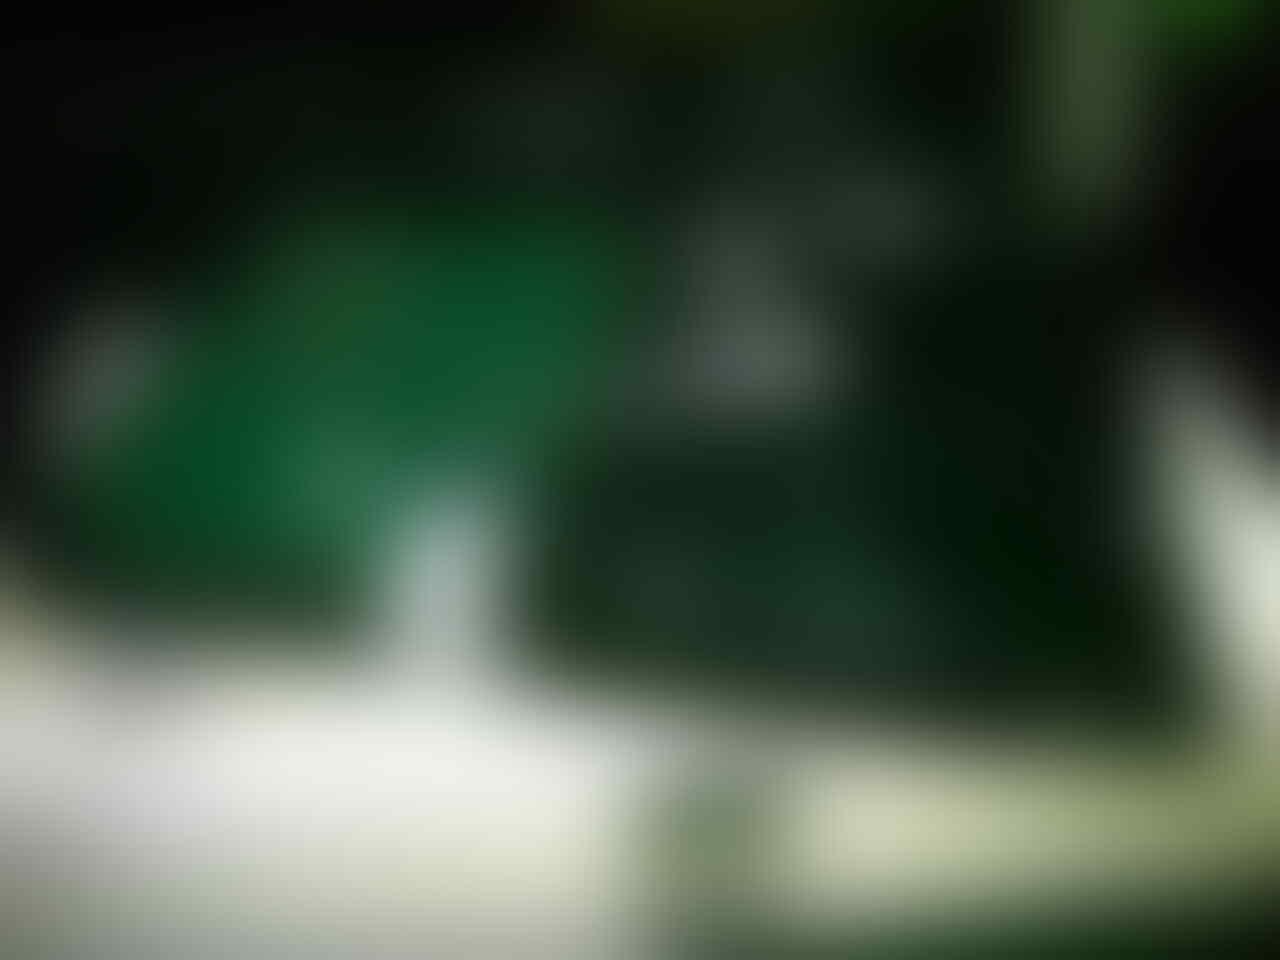 JUAL MURAH HDD SEAGATE 250GB FULL ISI MOVIES - BANDUNG